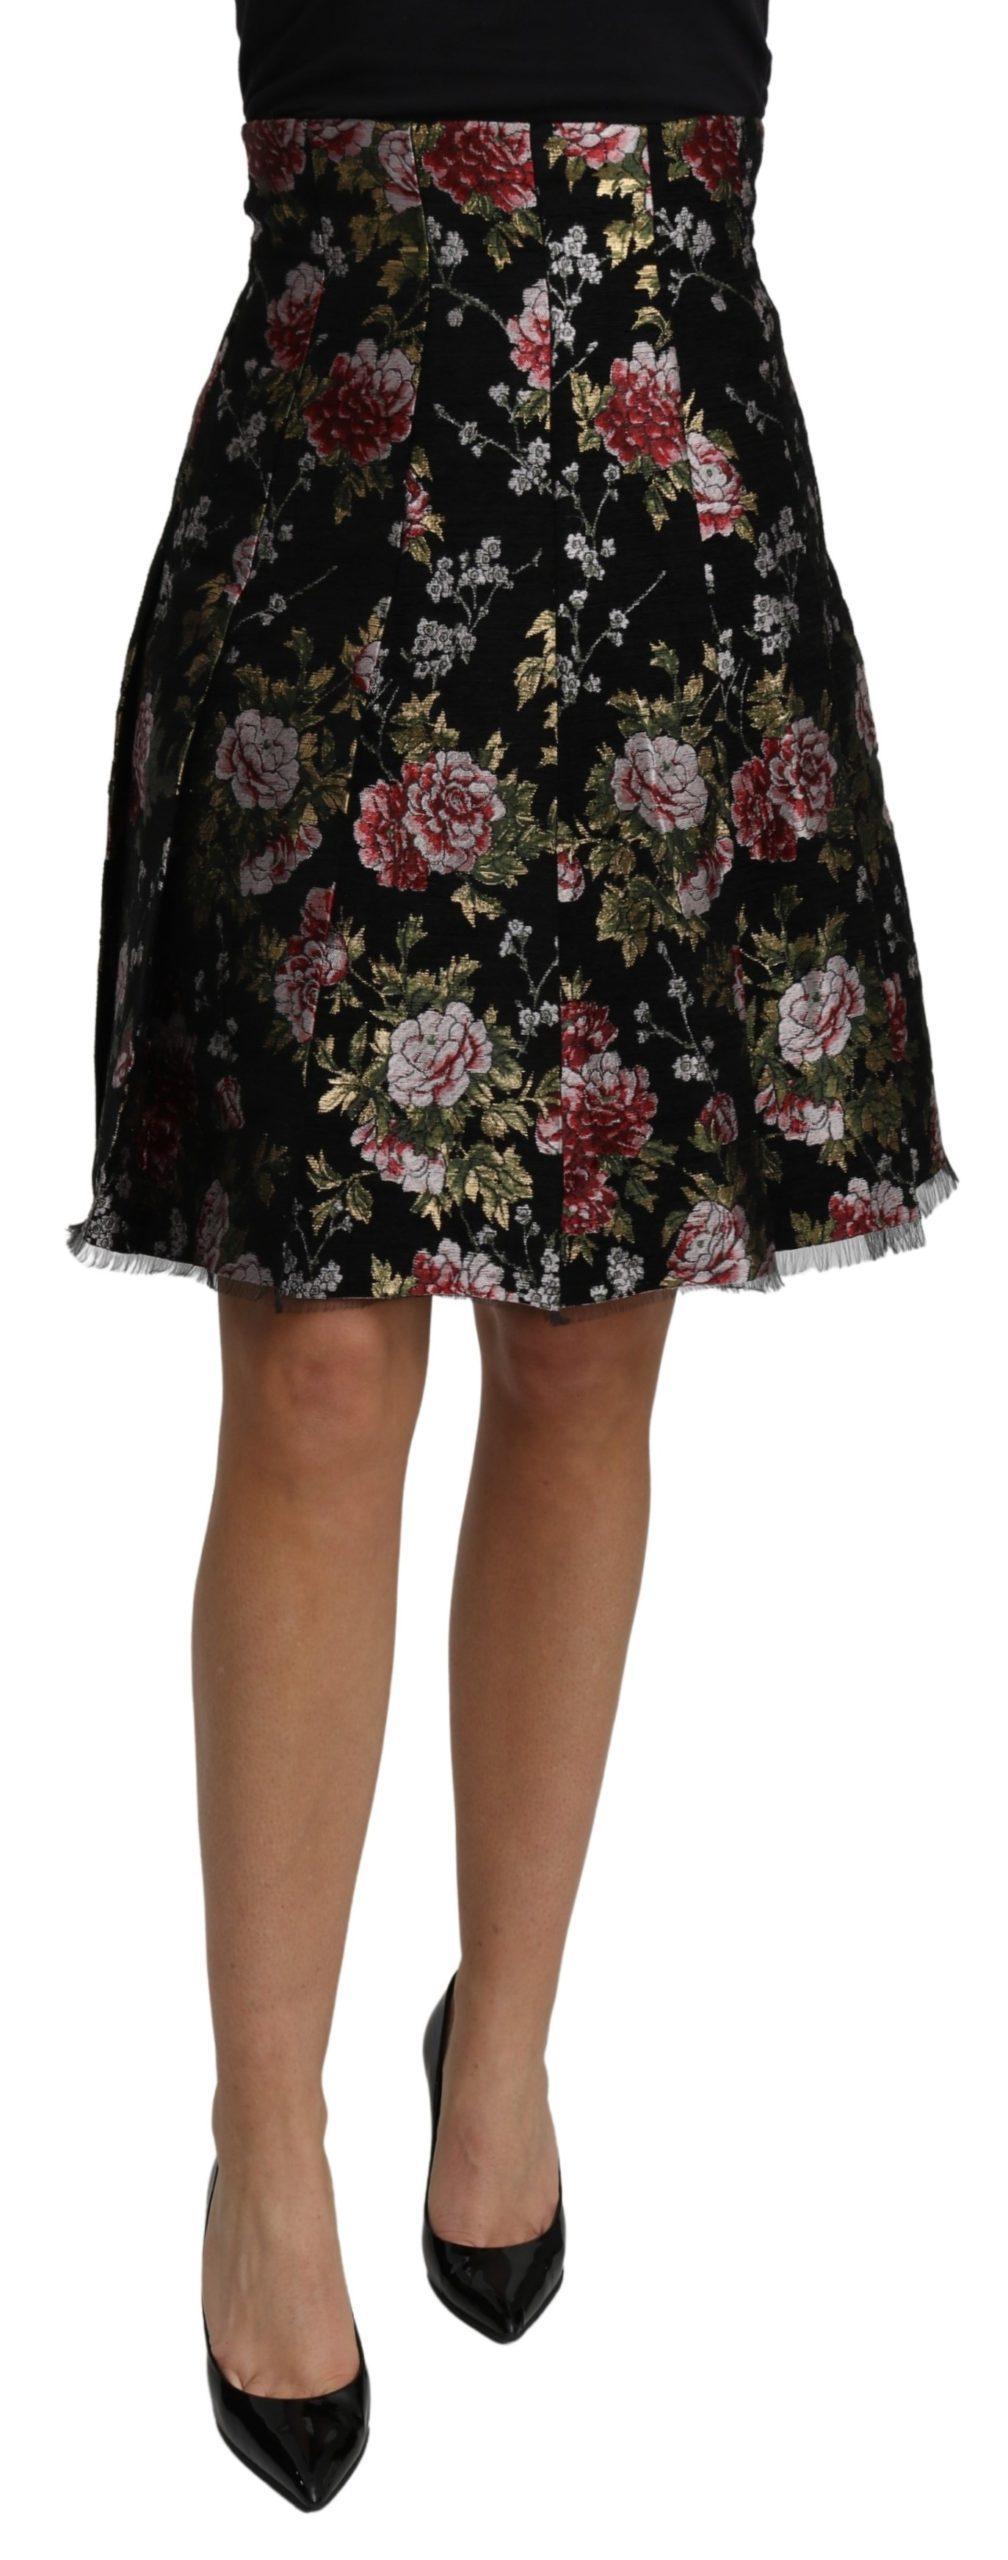 Dolce & Gabbana Women's Jacquard High Waist A-line Mini Skirt Black SKI1466 - IT38|XS